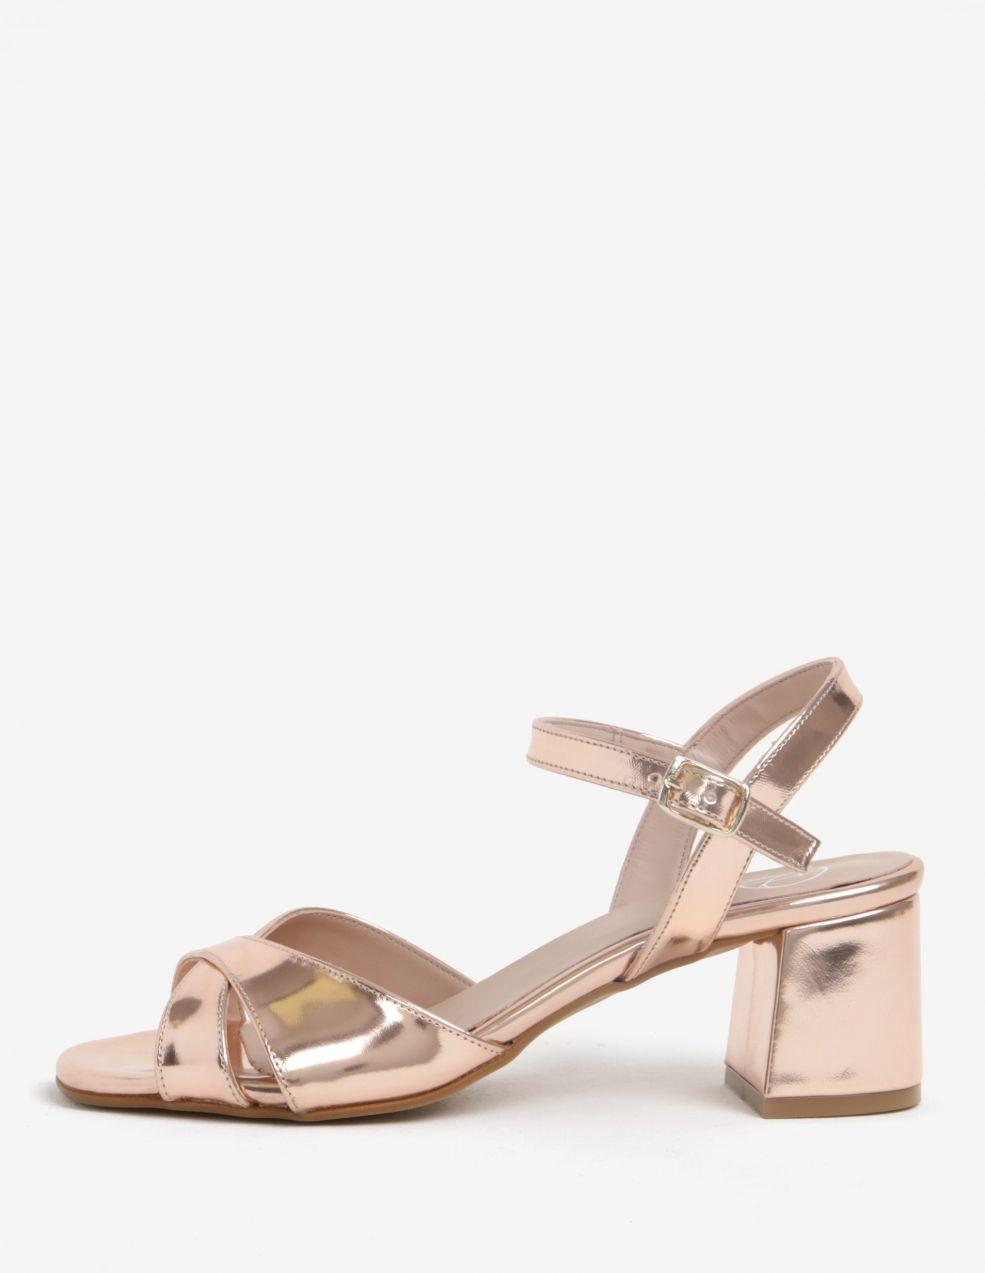 ebb307dac2 Lesklé sandále v ružovozlatej farbe na širokom podpätku OJJU značky OJJU -  Lovely.sk